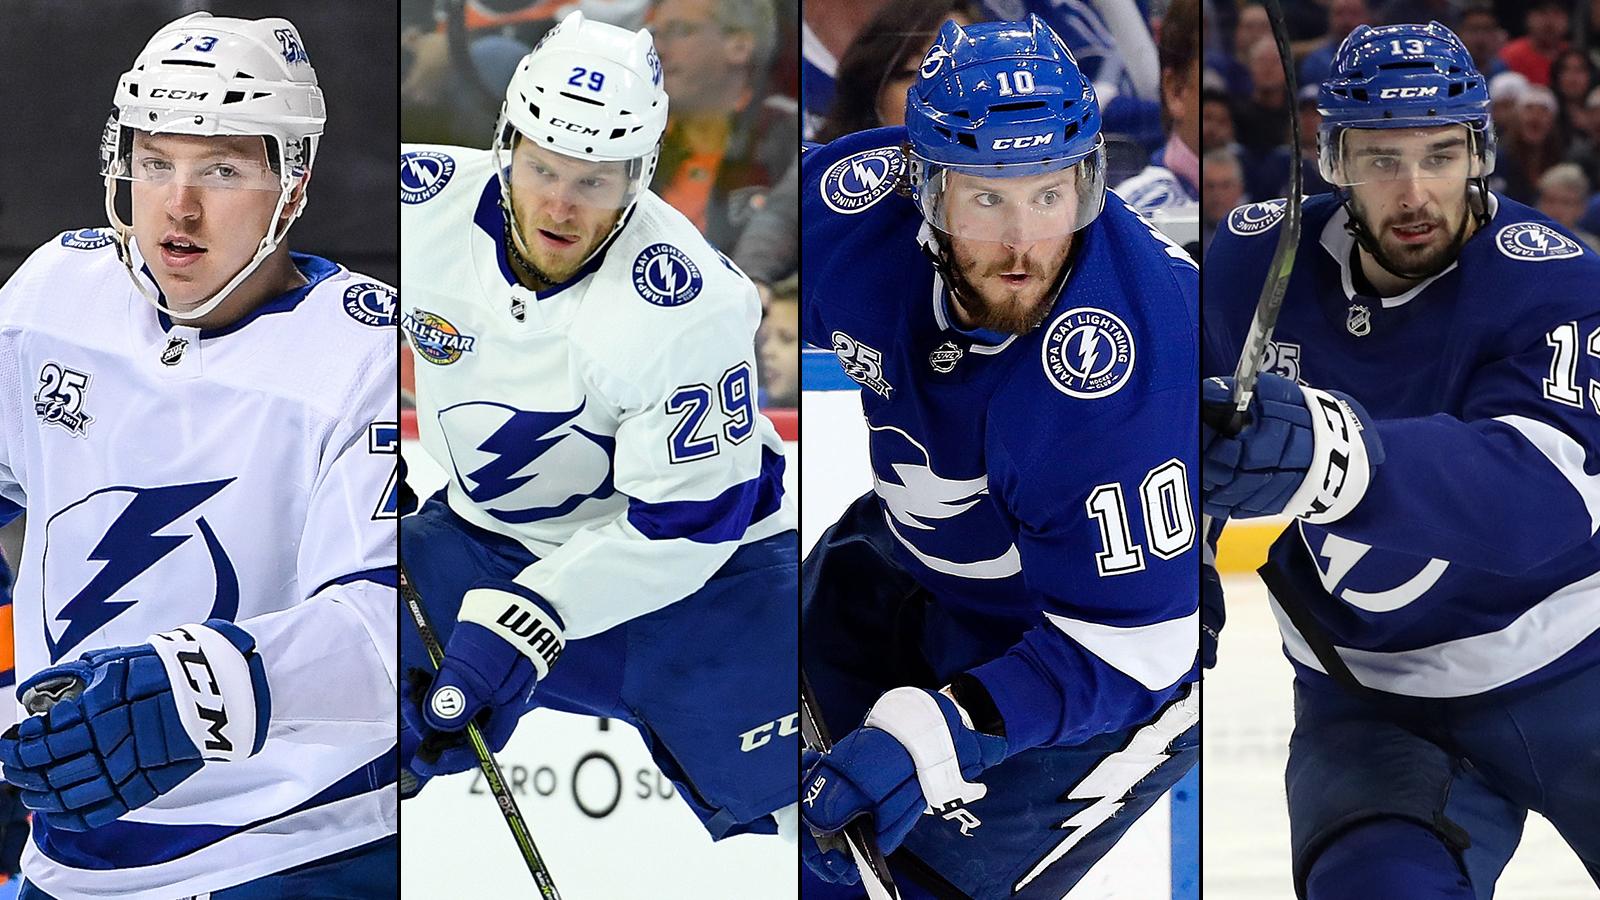 Lightning issue qualifying offers to Adam Erne, Slater Koekkoek, JT Miller, Cedric Paquette